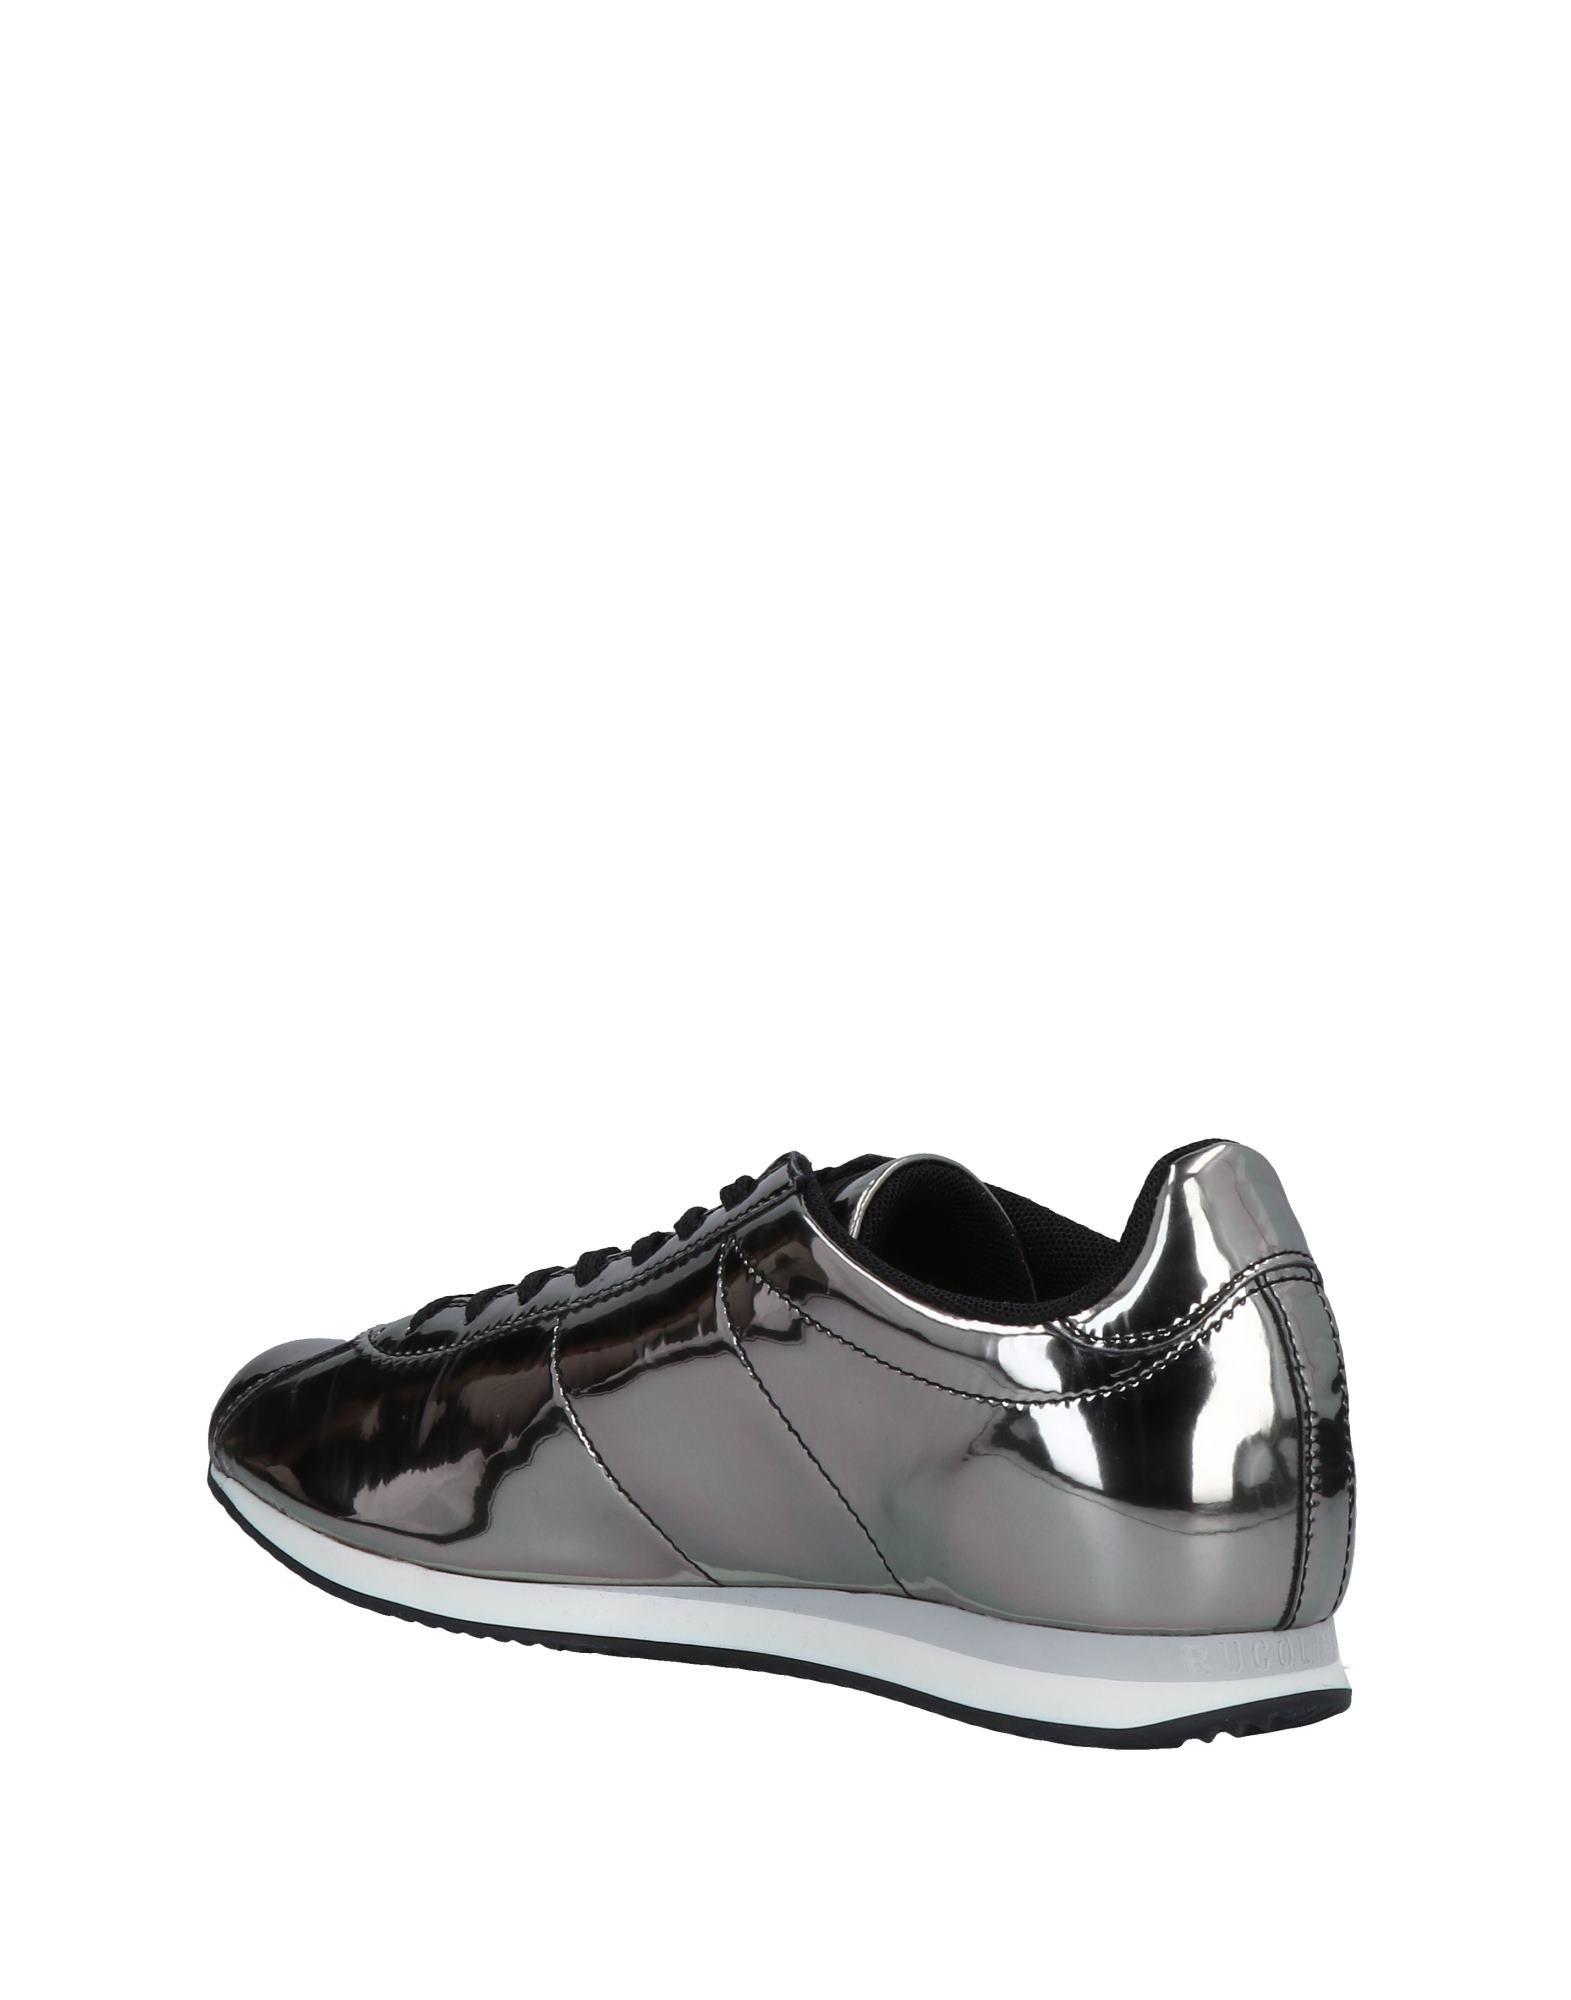 Ruco Line Sneakers Damen  11476812WN Neue Schuhe Schuhe Schuhe 82acc1